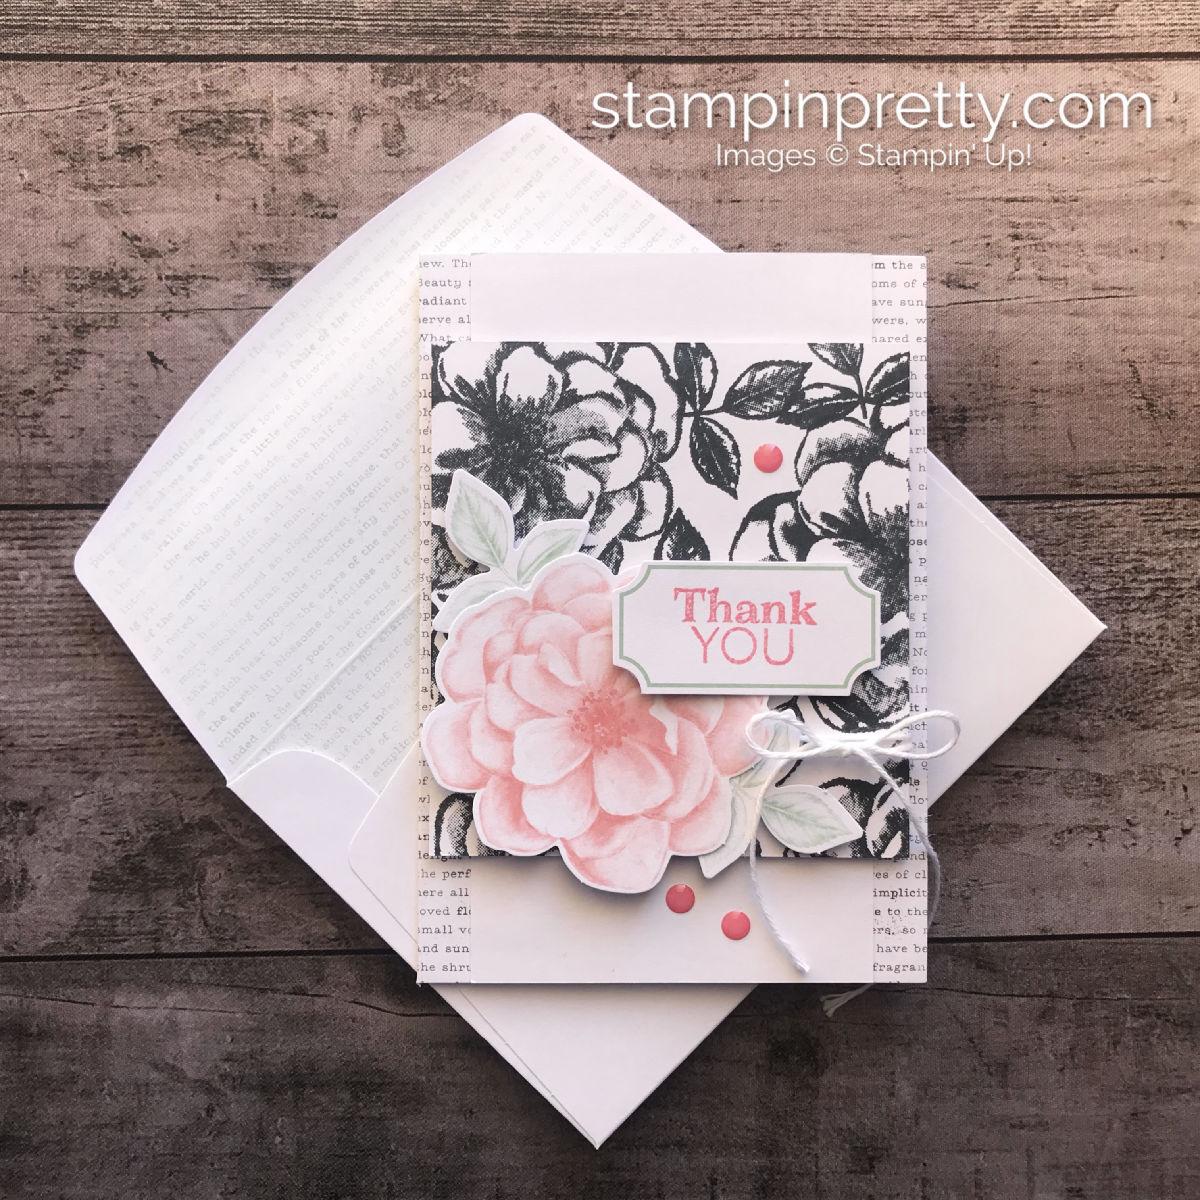 Paper Pumpkin April 2019 Card Ideas April Paper Pumpkin Card Ideas & Shelli's Kit Coming! | Stampin